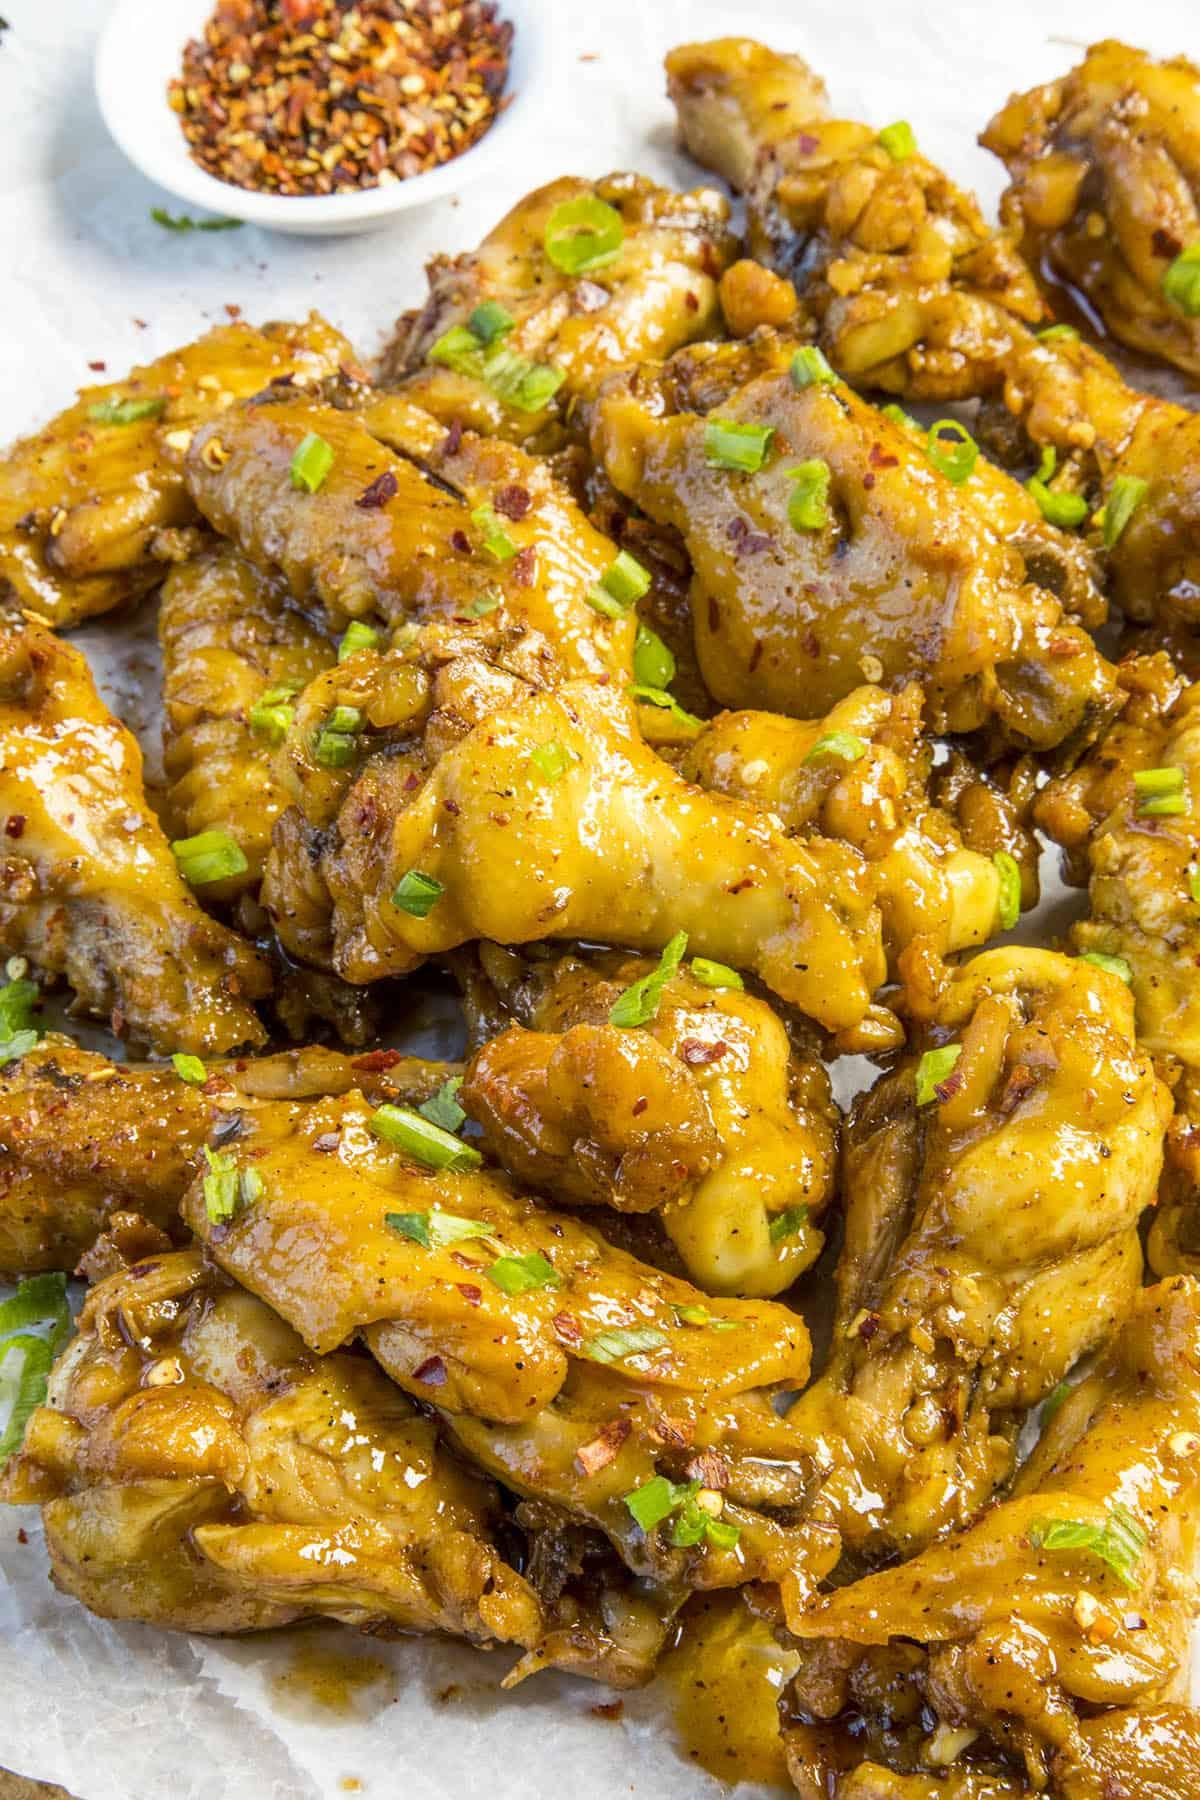 Sticky Chicken Wings, glistening with sticky sauce